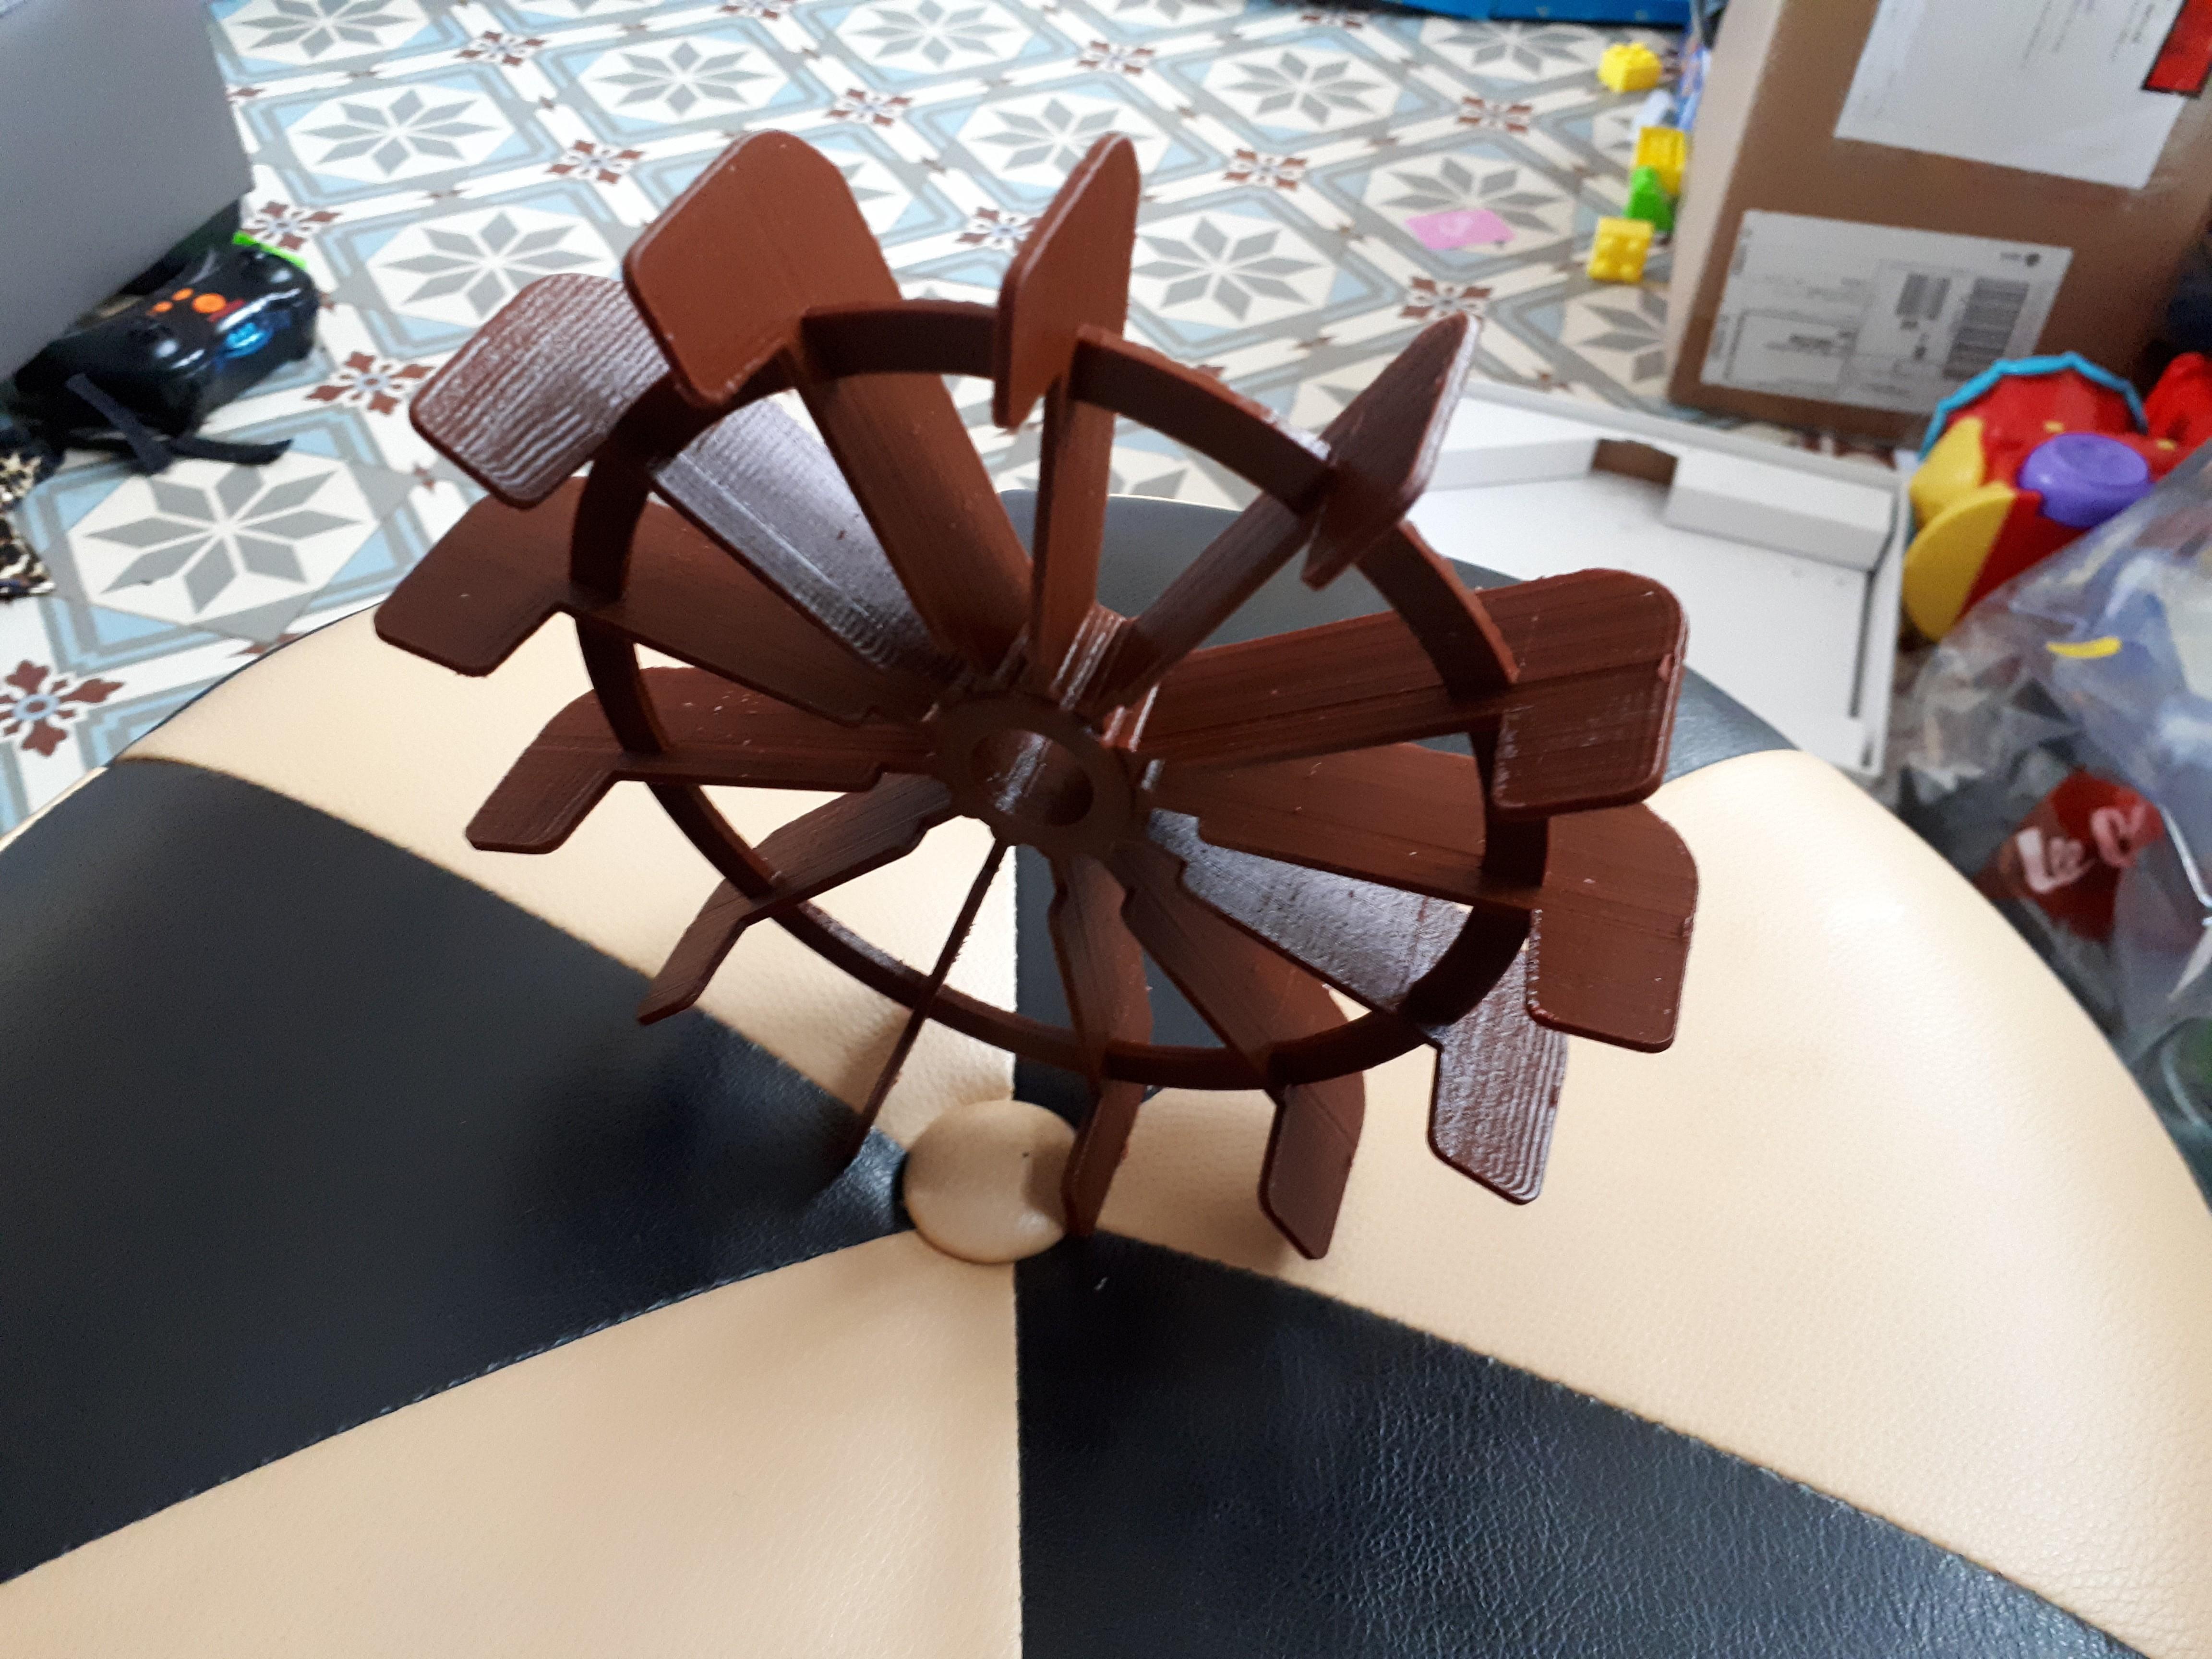 20180625_185046.jpg Download STL file electric motor cooling • 3D print object, nicodem6087